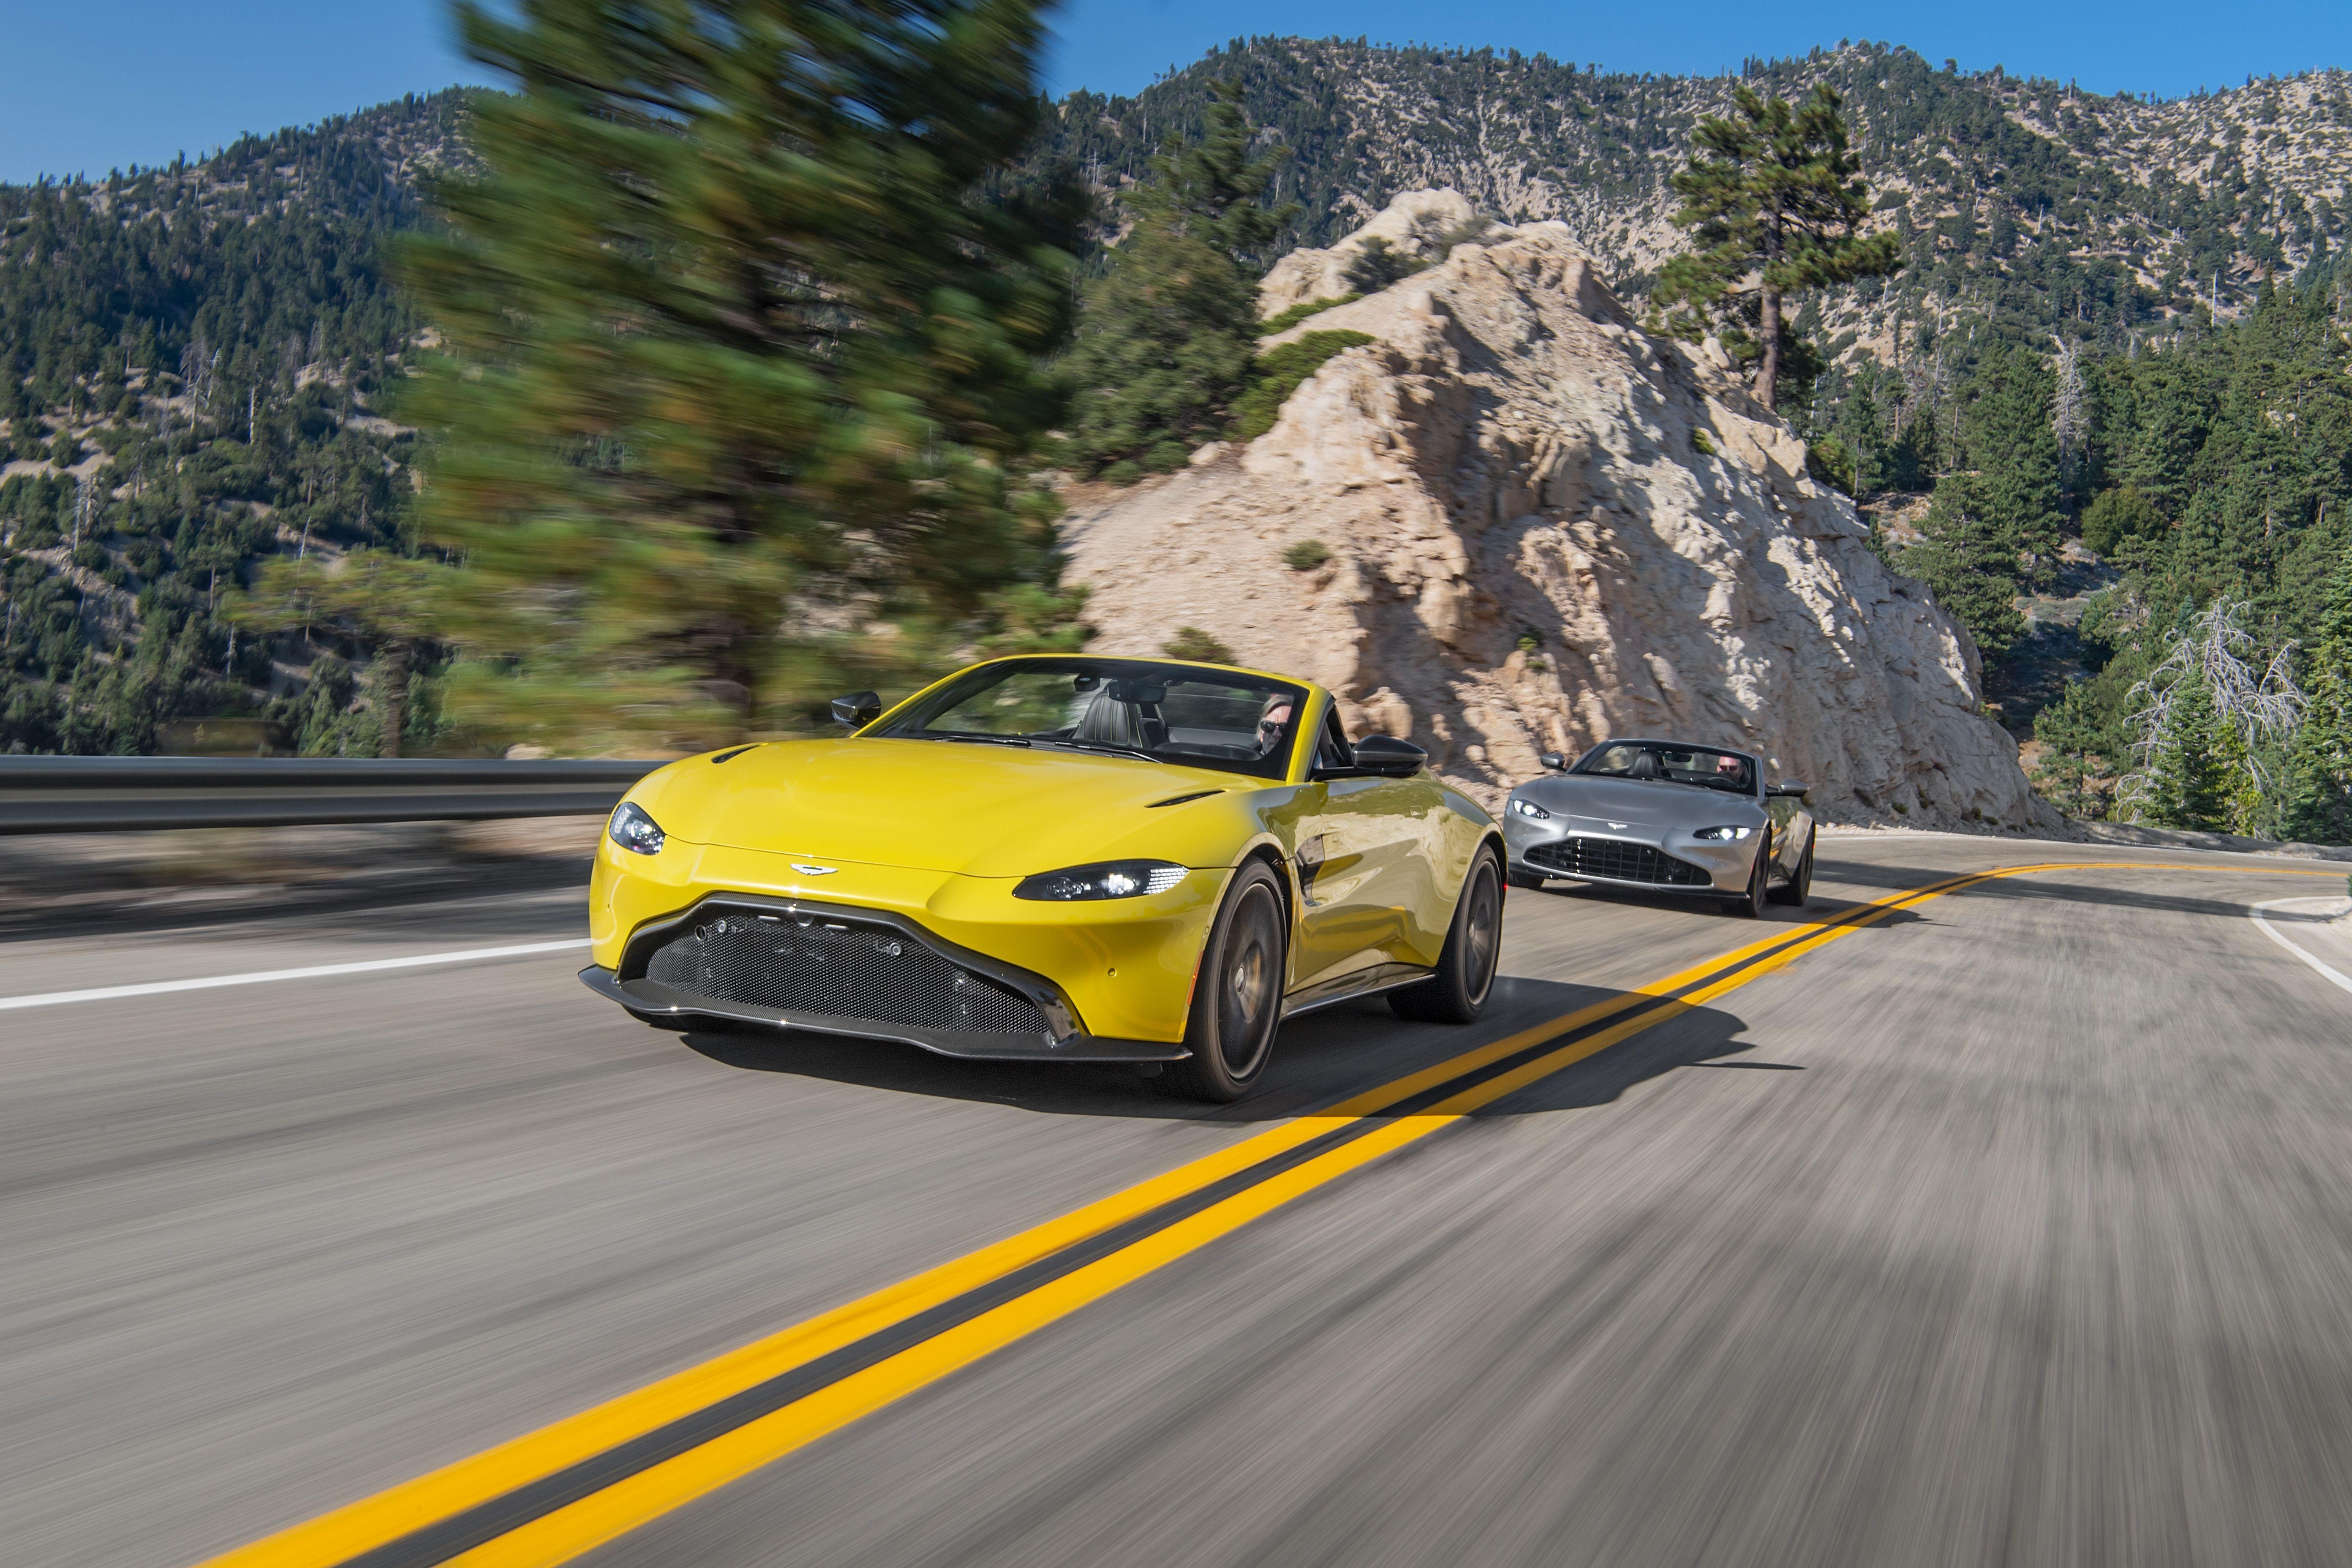 Aston Martin To Gain Tech From Closer Mercedes Benz Ties